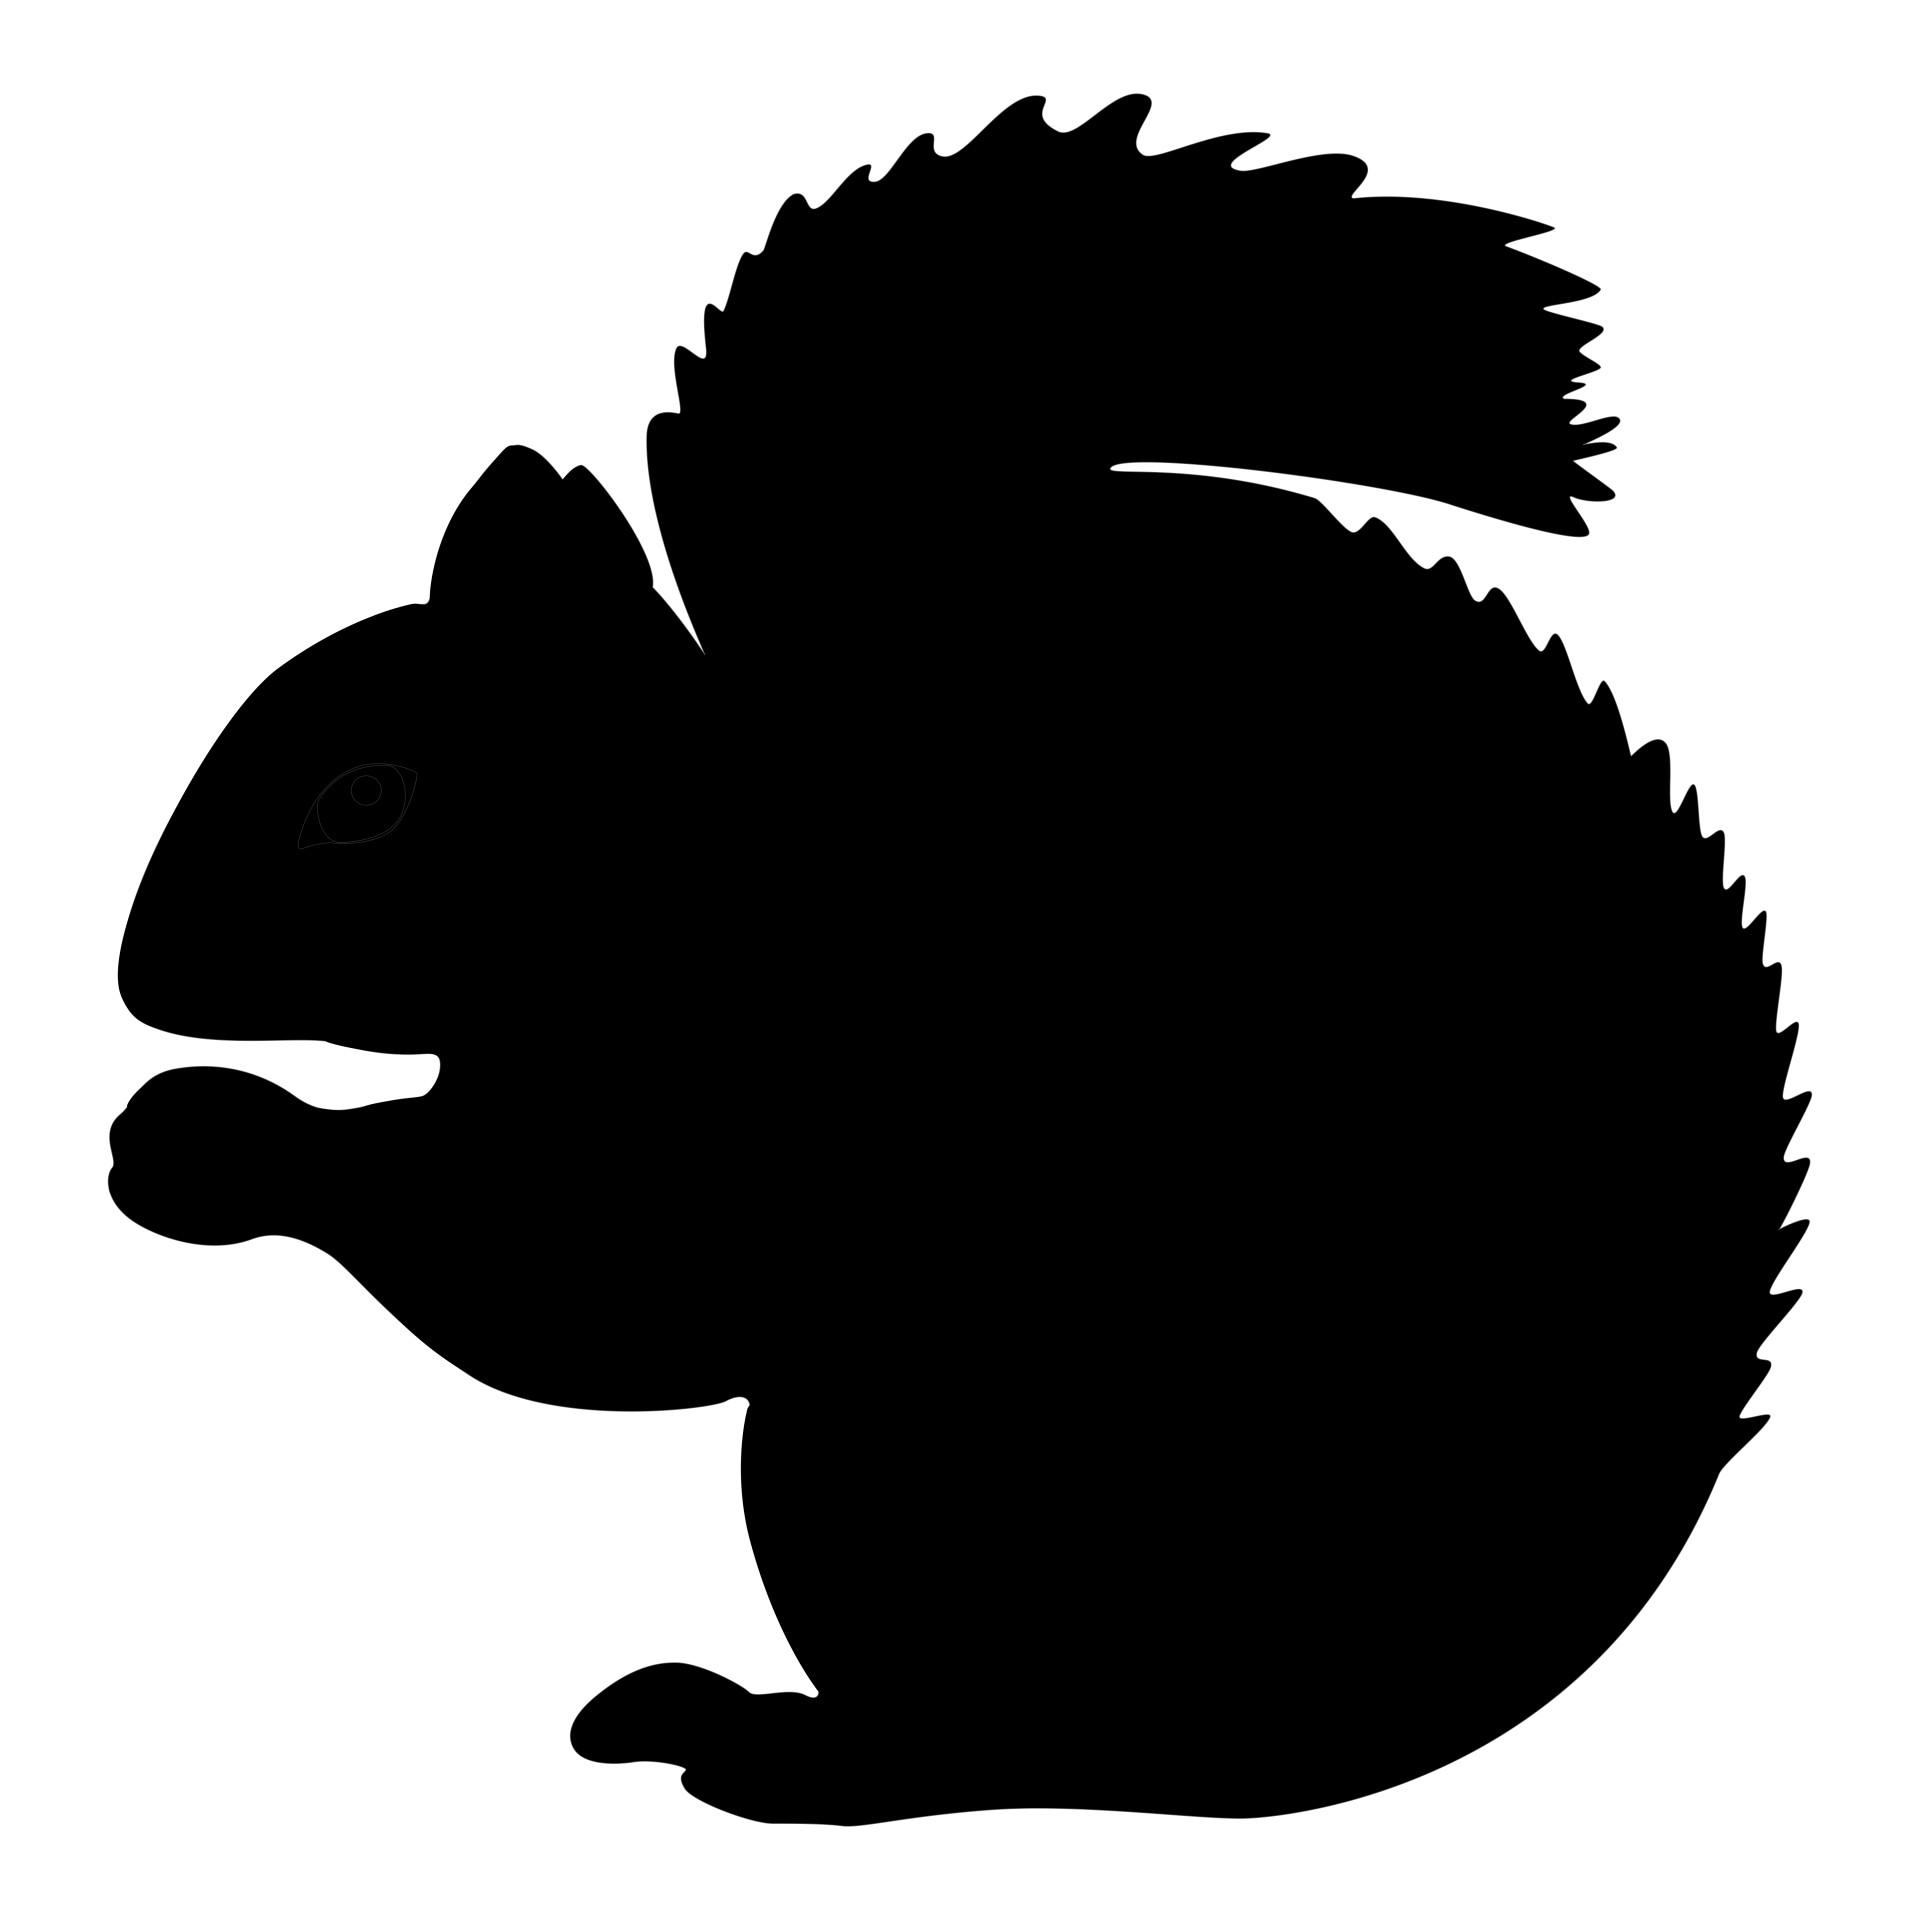 1920x1920 Grey Squirrel Free Stock Photo